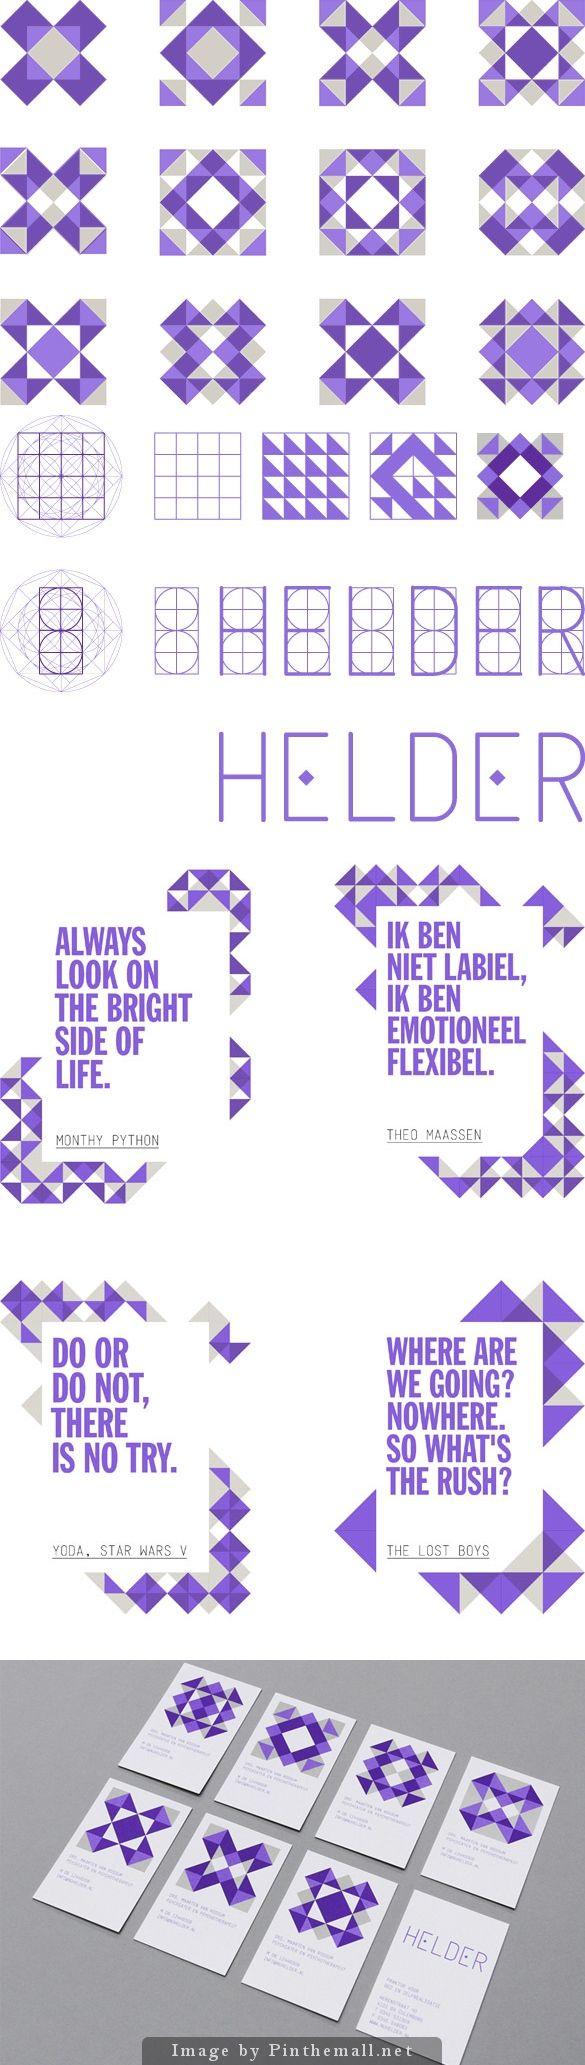 HELDER Identity - cooee - created via http://pinthemall.net